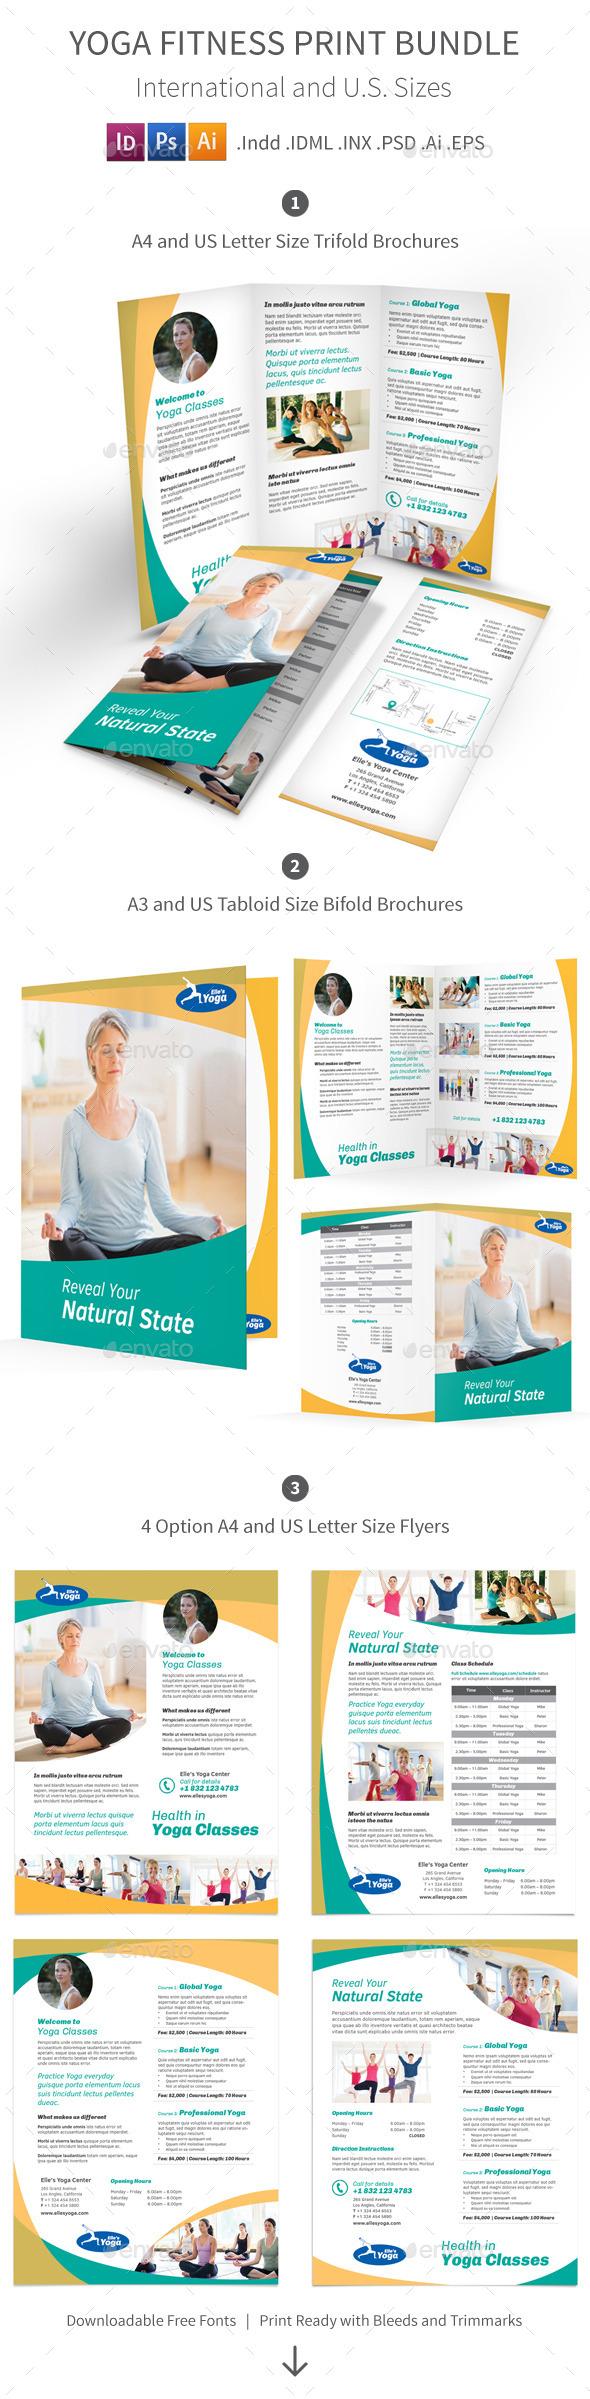 Yoga Fitness Print Bundle - Informational Brochures